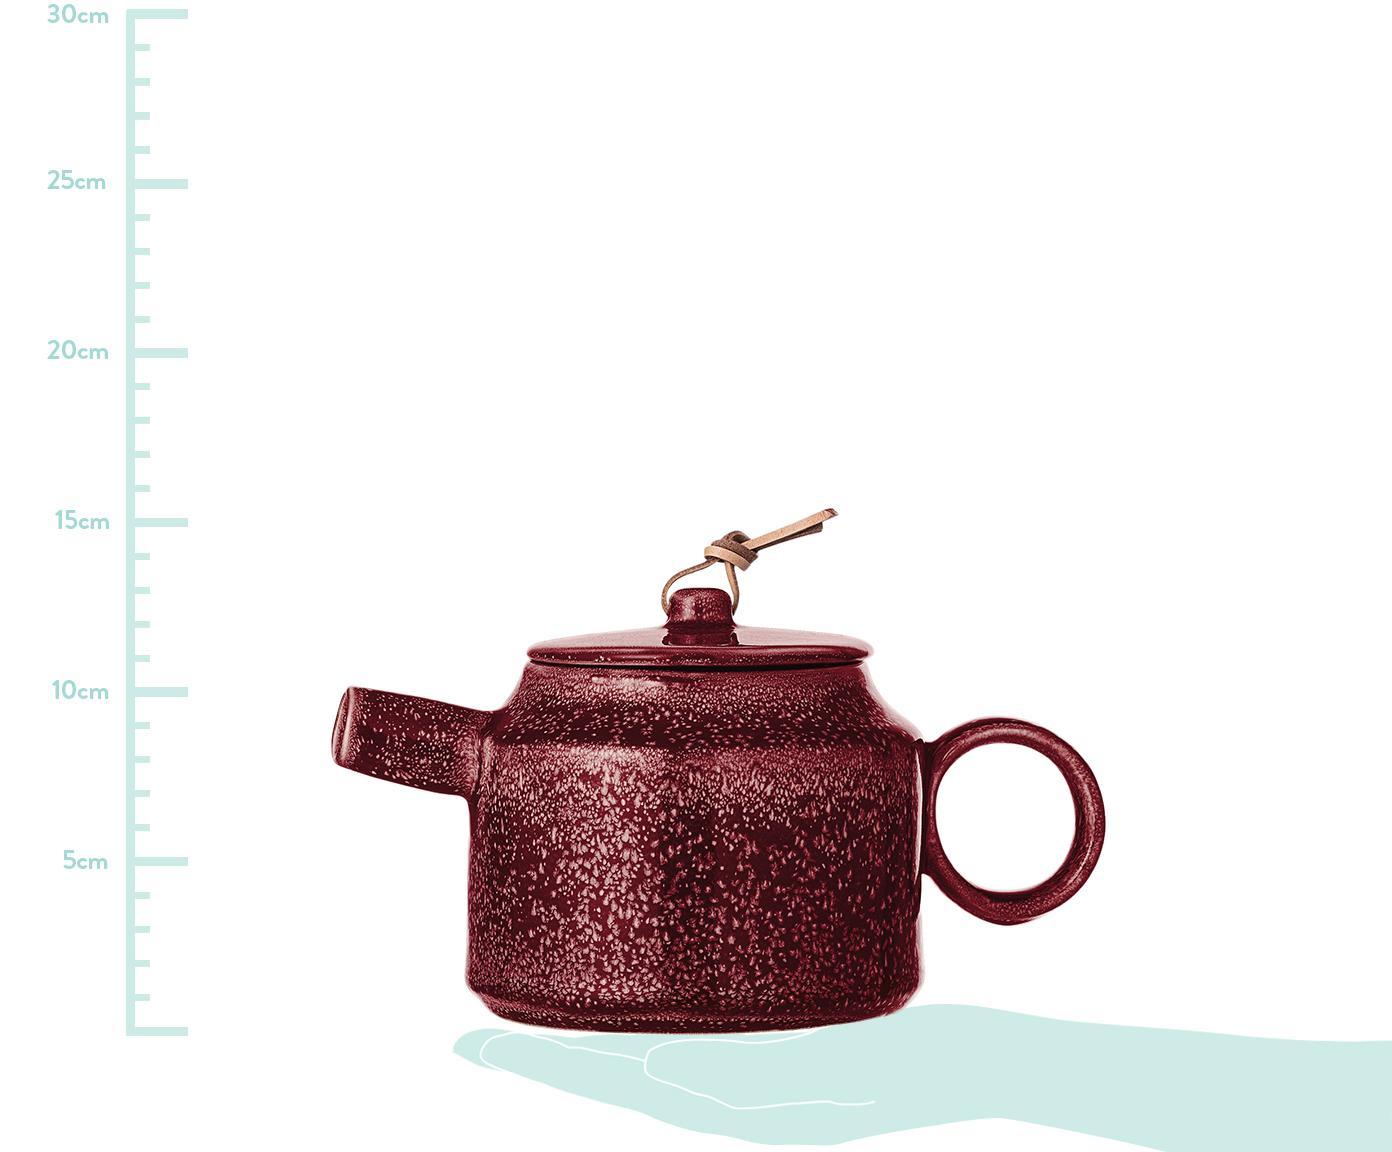 Teiera fatta a mano Joëlle, Teiera: terracotta, Cinturino: pelle, Rosso scuro, 570 ml